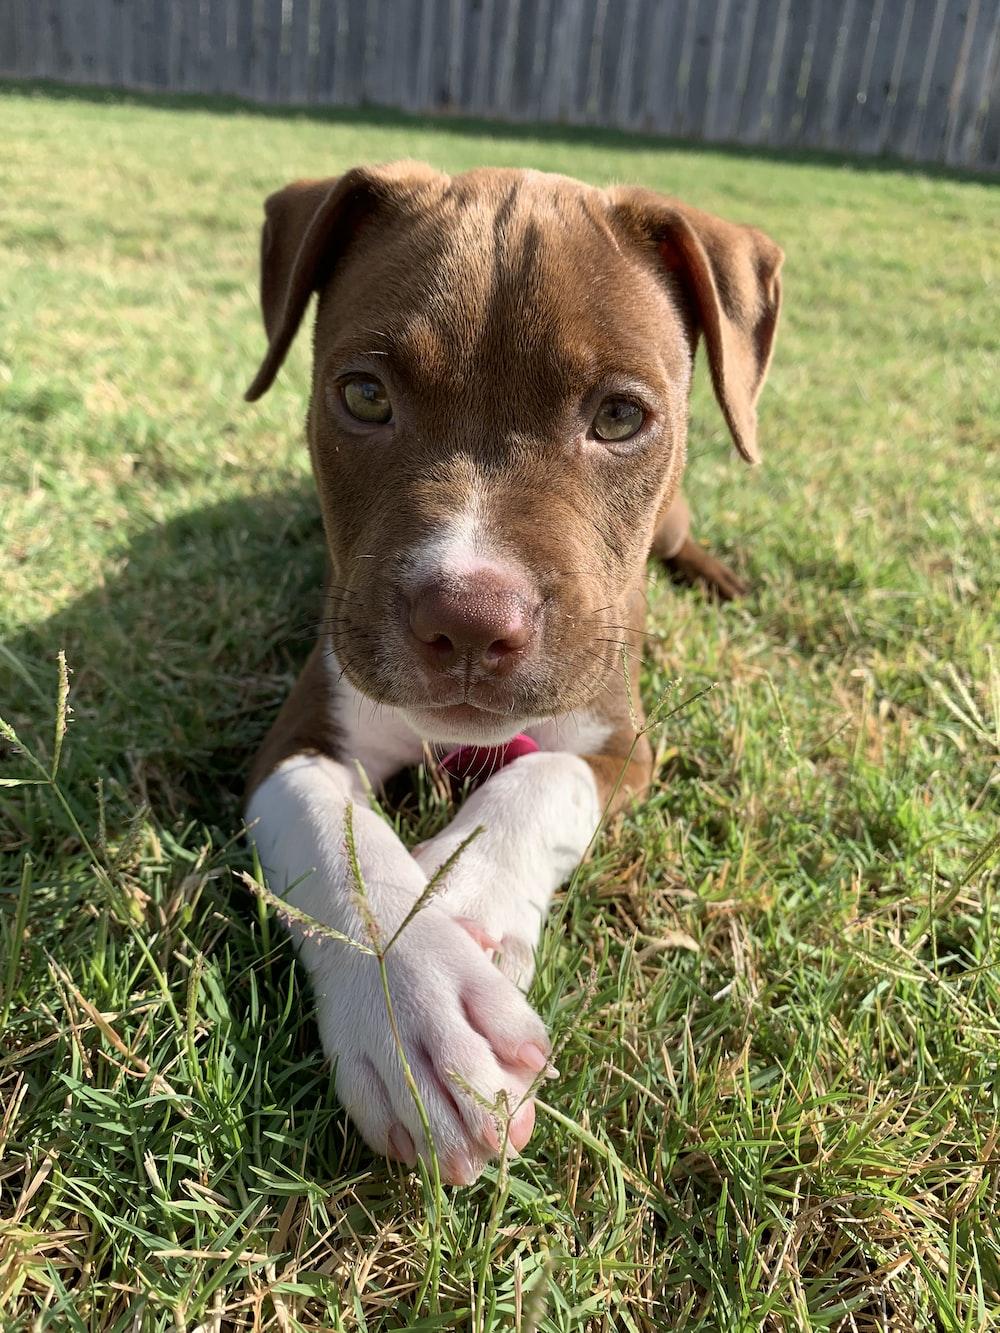 puppy lies on grass